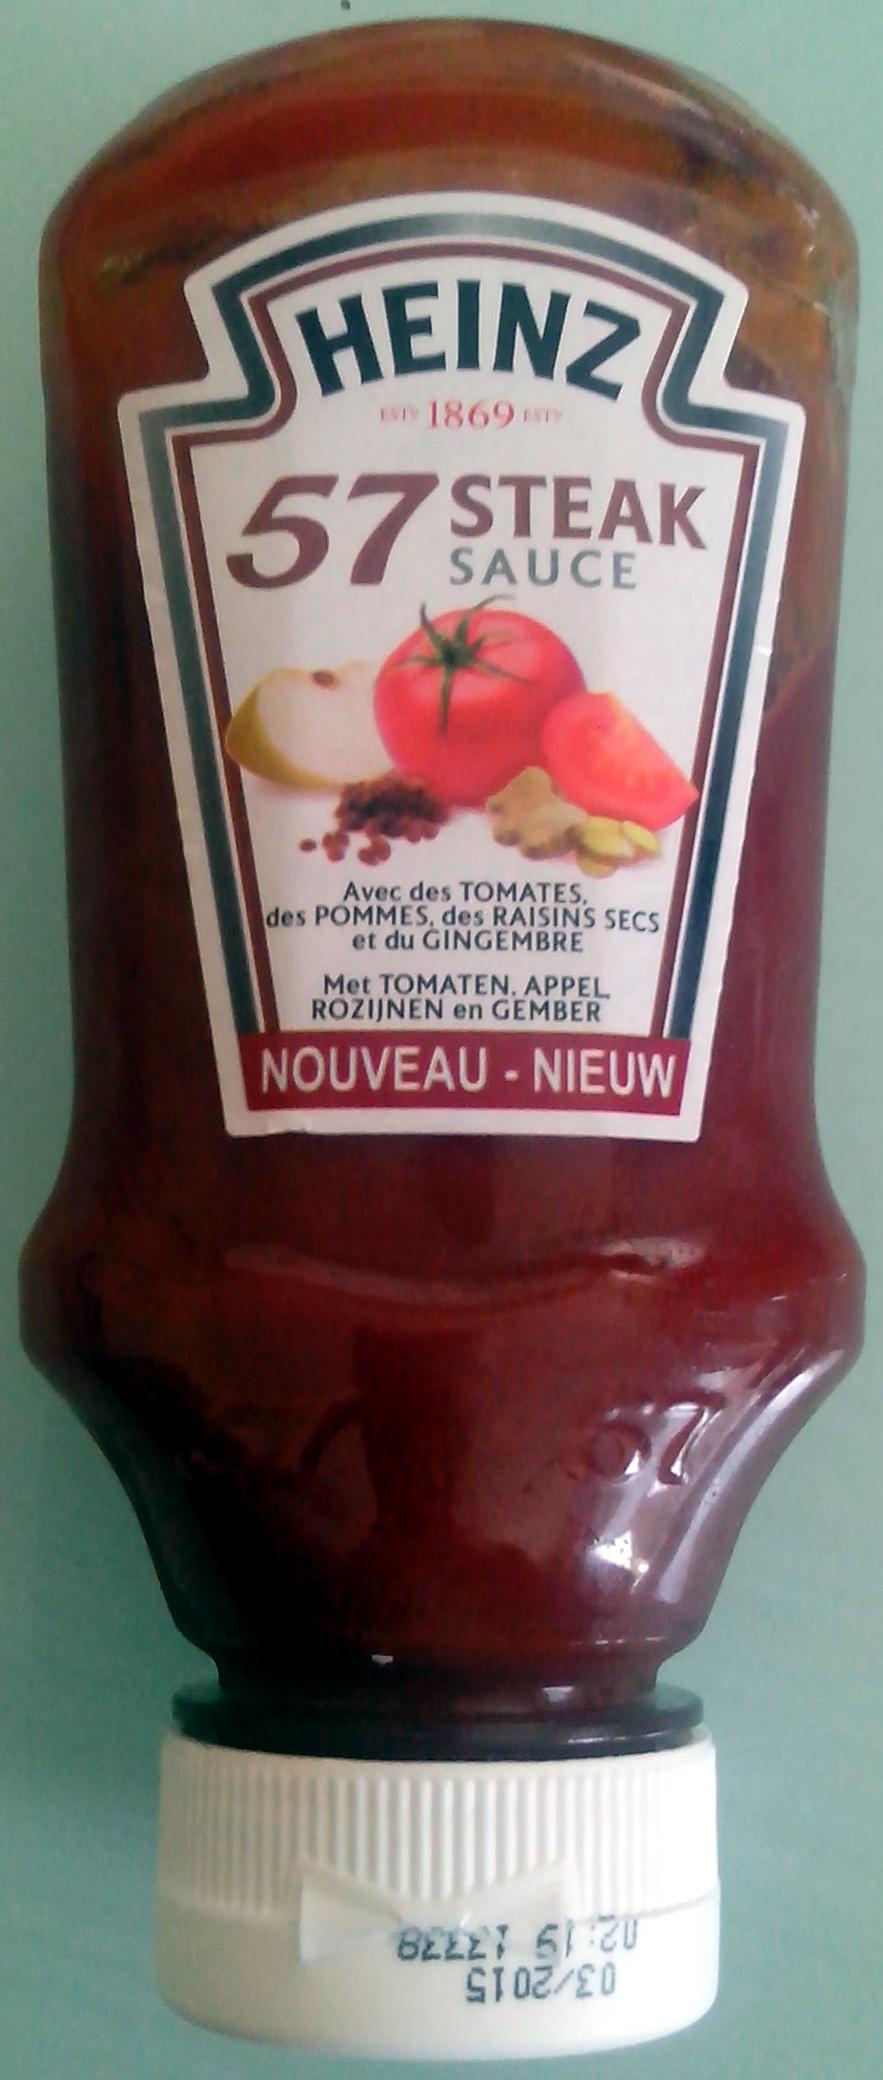 57 steak sauce - Product - fr